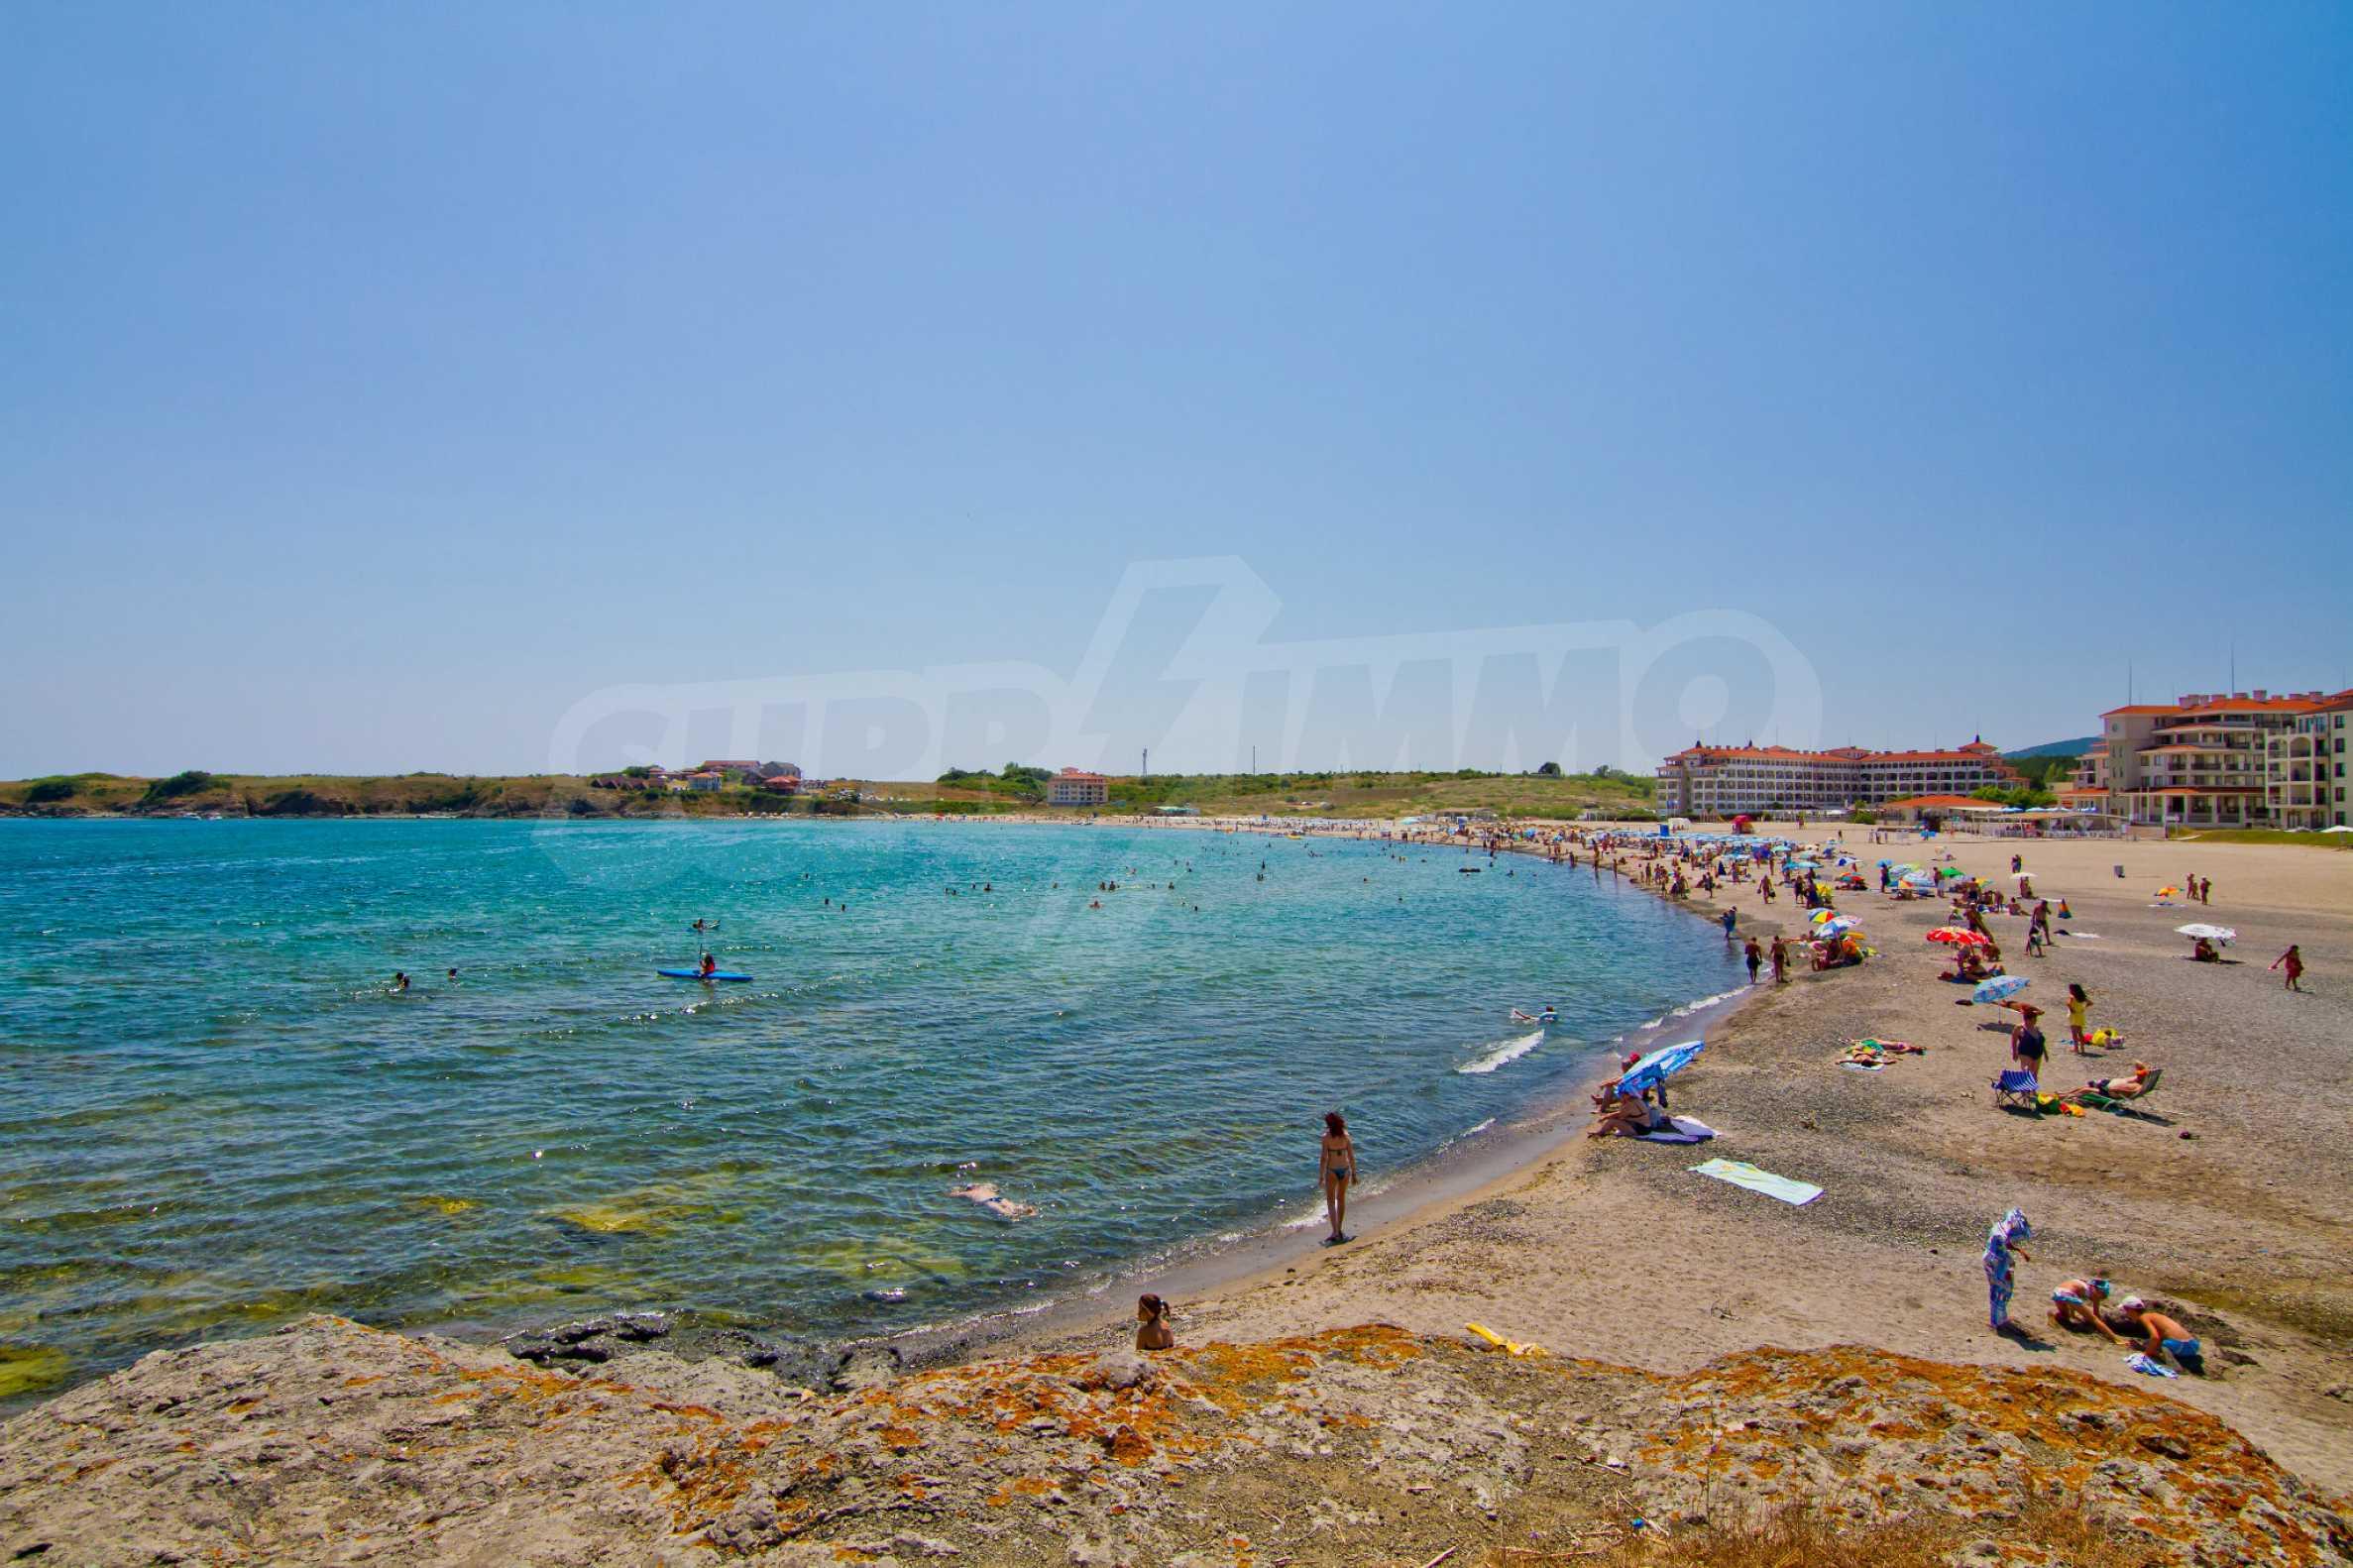 Примеа Бийч Резиденс / Primea Beach Residence 18